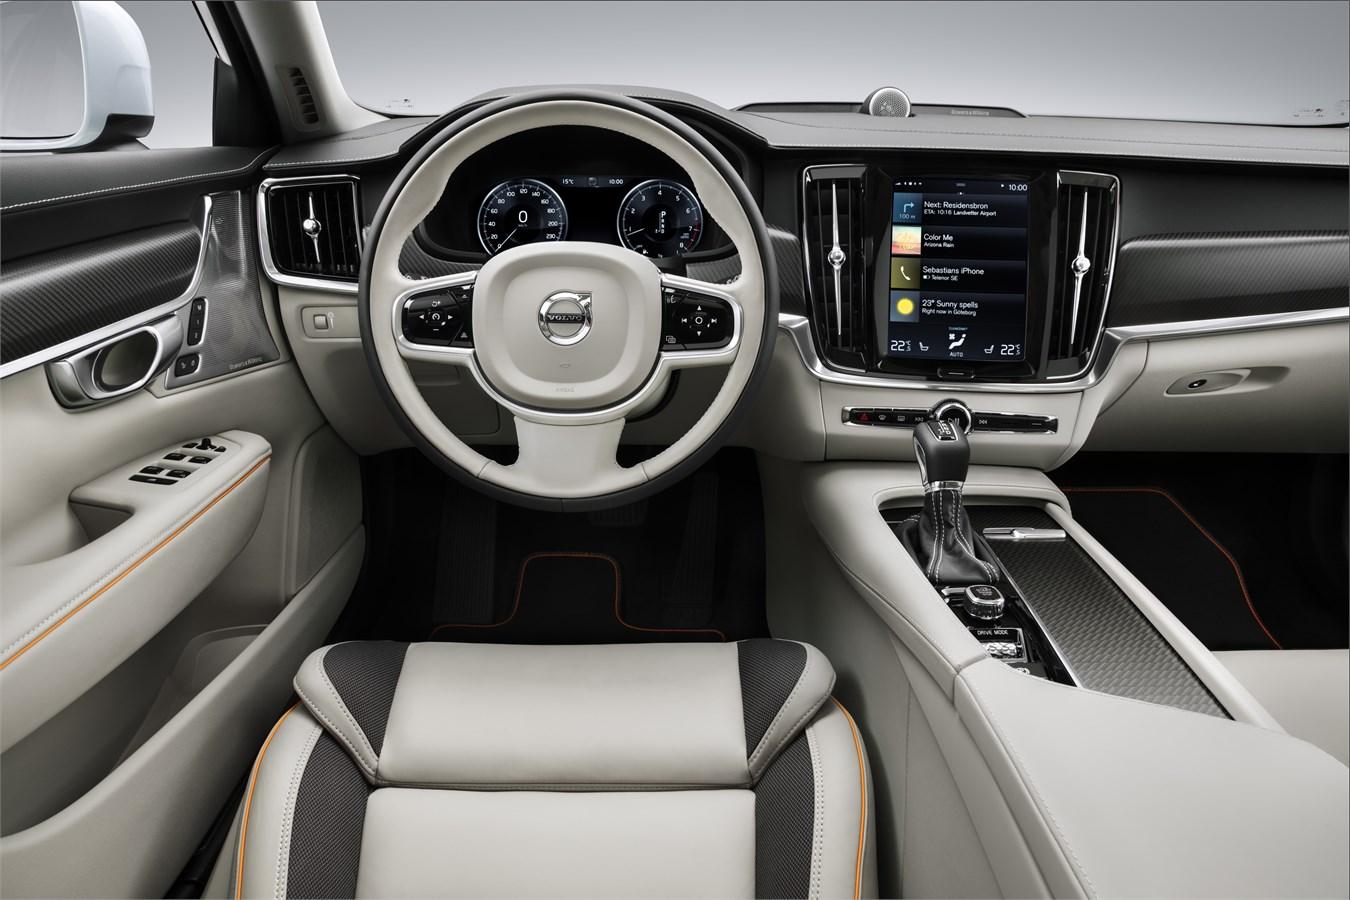 Volvo V90 Cross Country Volvo Ocean Race interior - Volvo Car Group ...